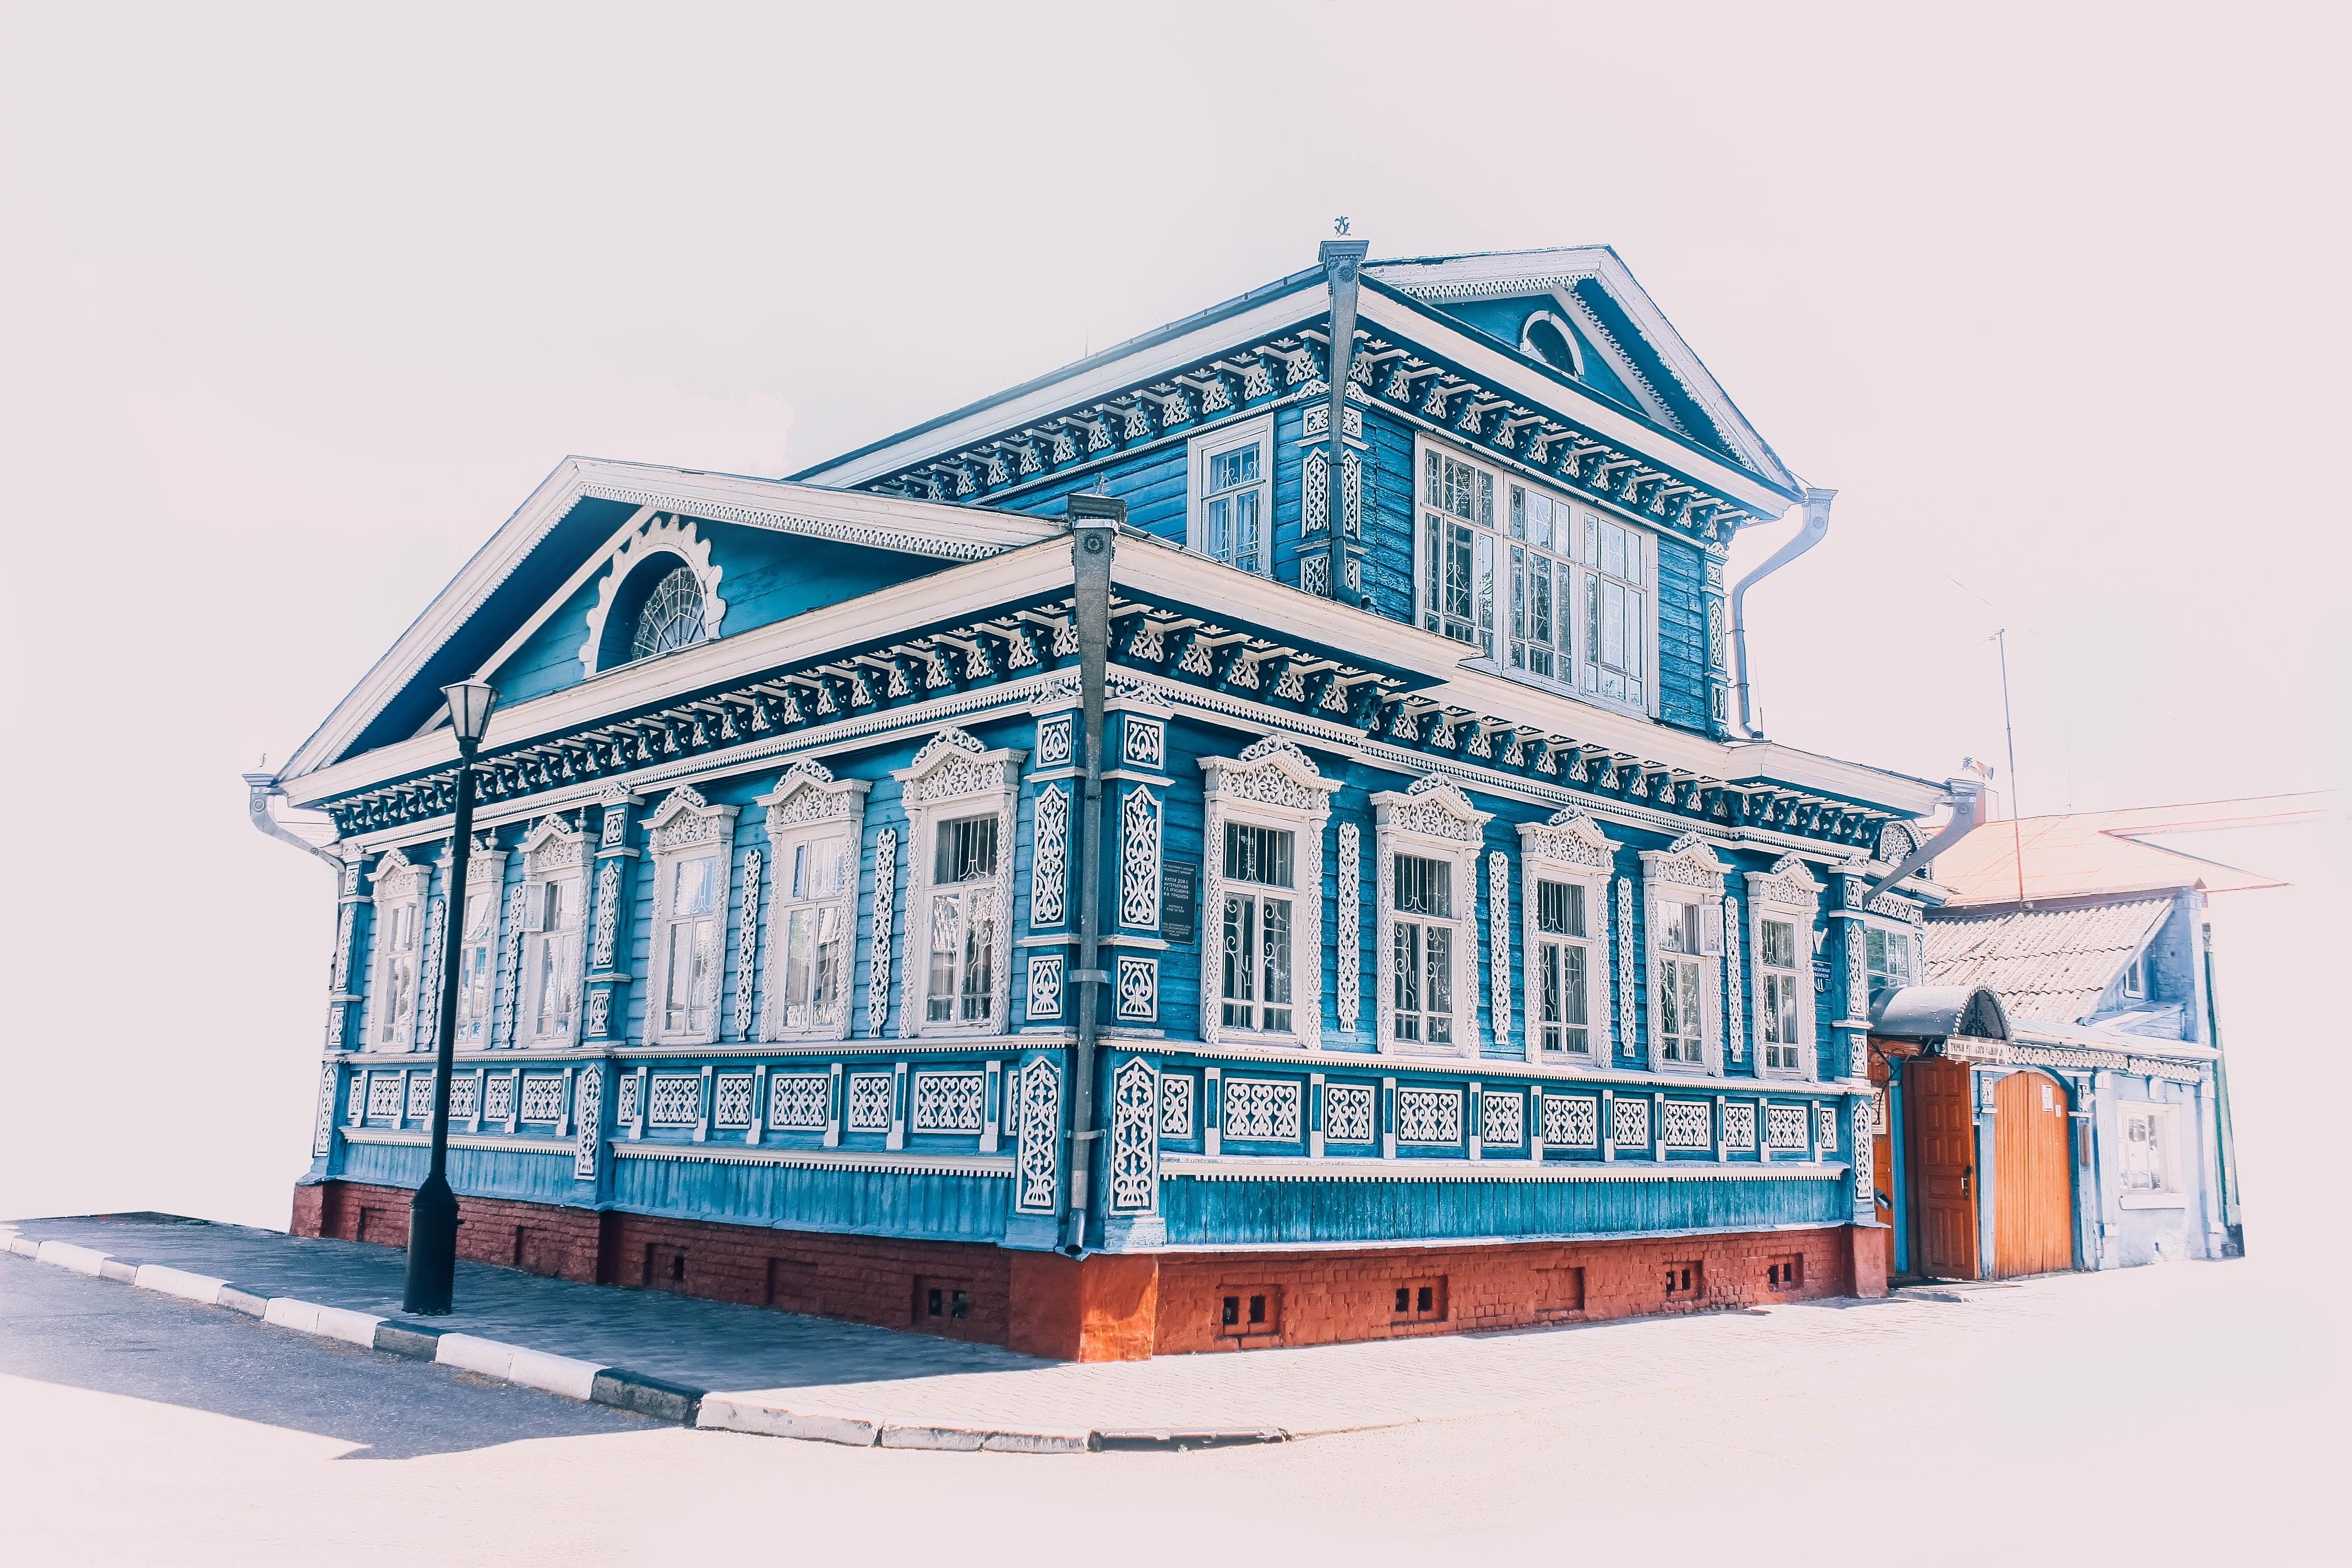 Kumpulan Gambar Sketsa Tukang Bangunan